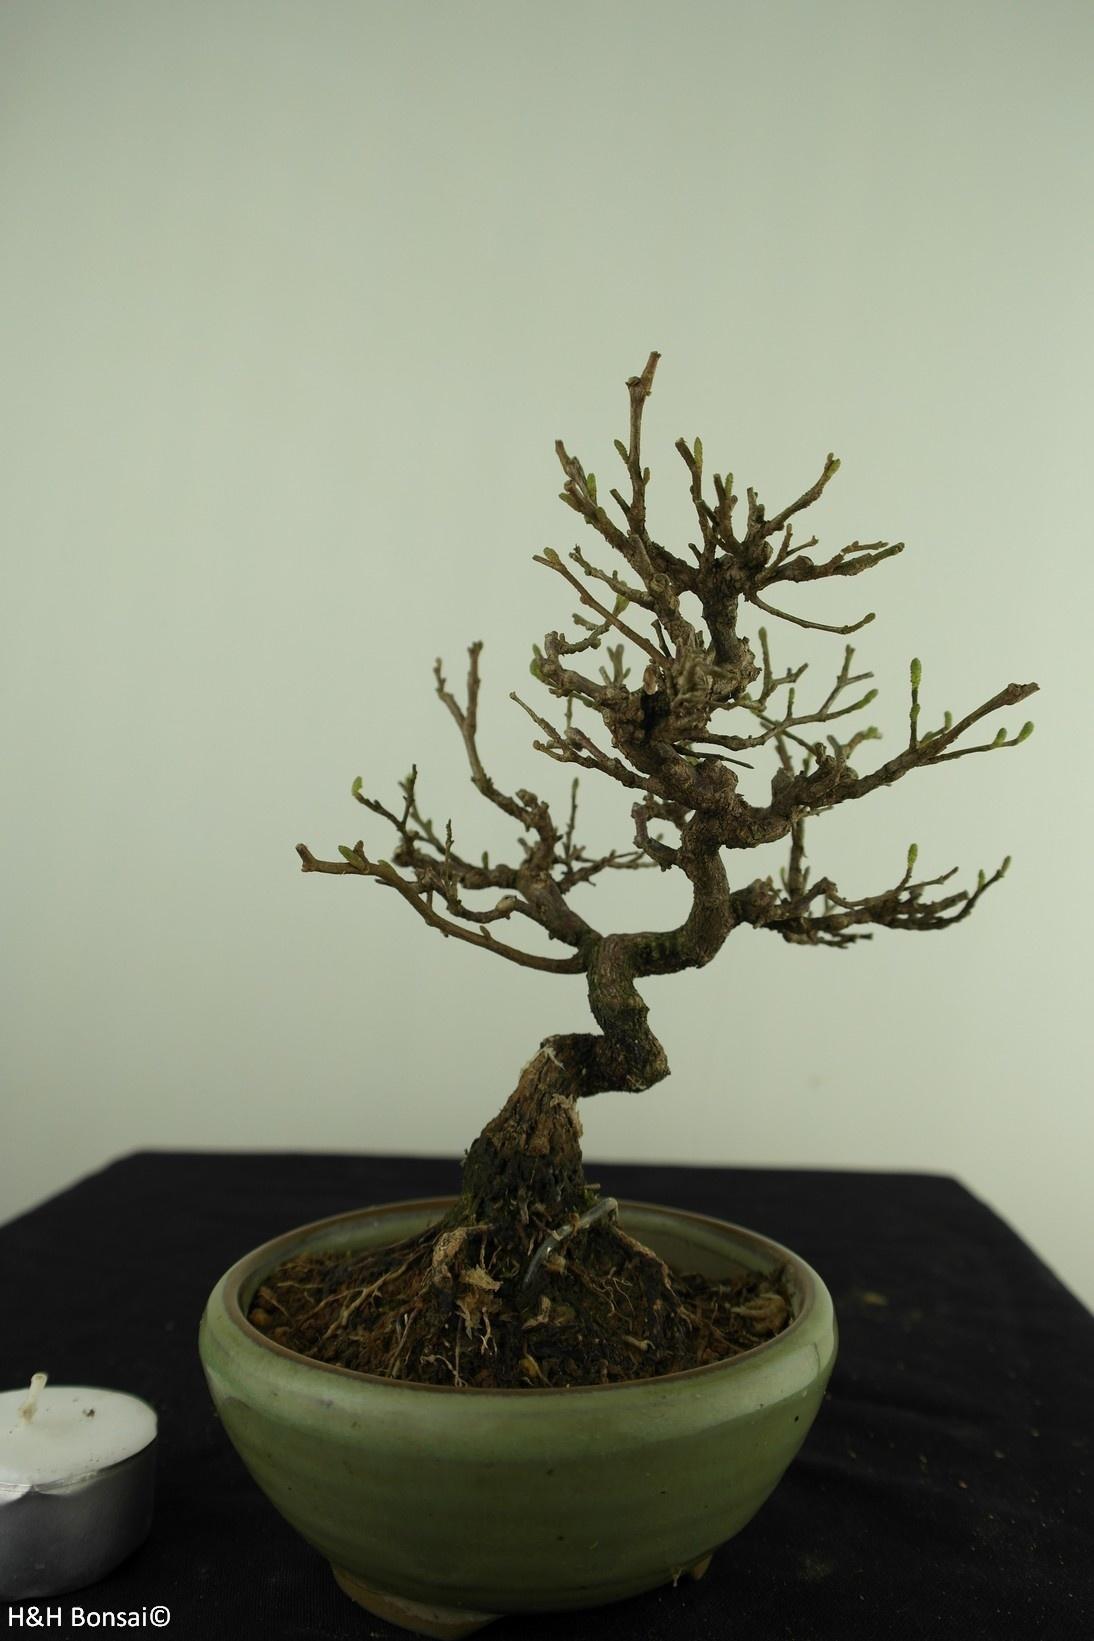 Bonsai Shohin Japanese snowbell, Styrax japonicus,no. 7790